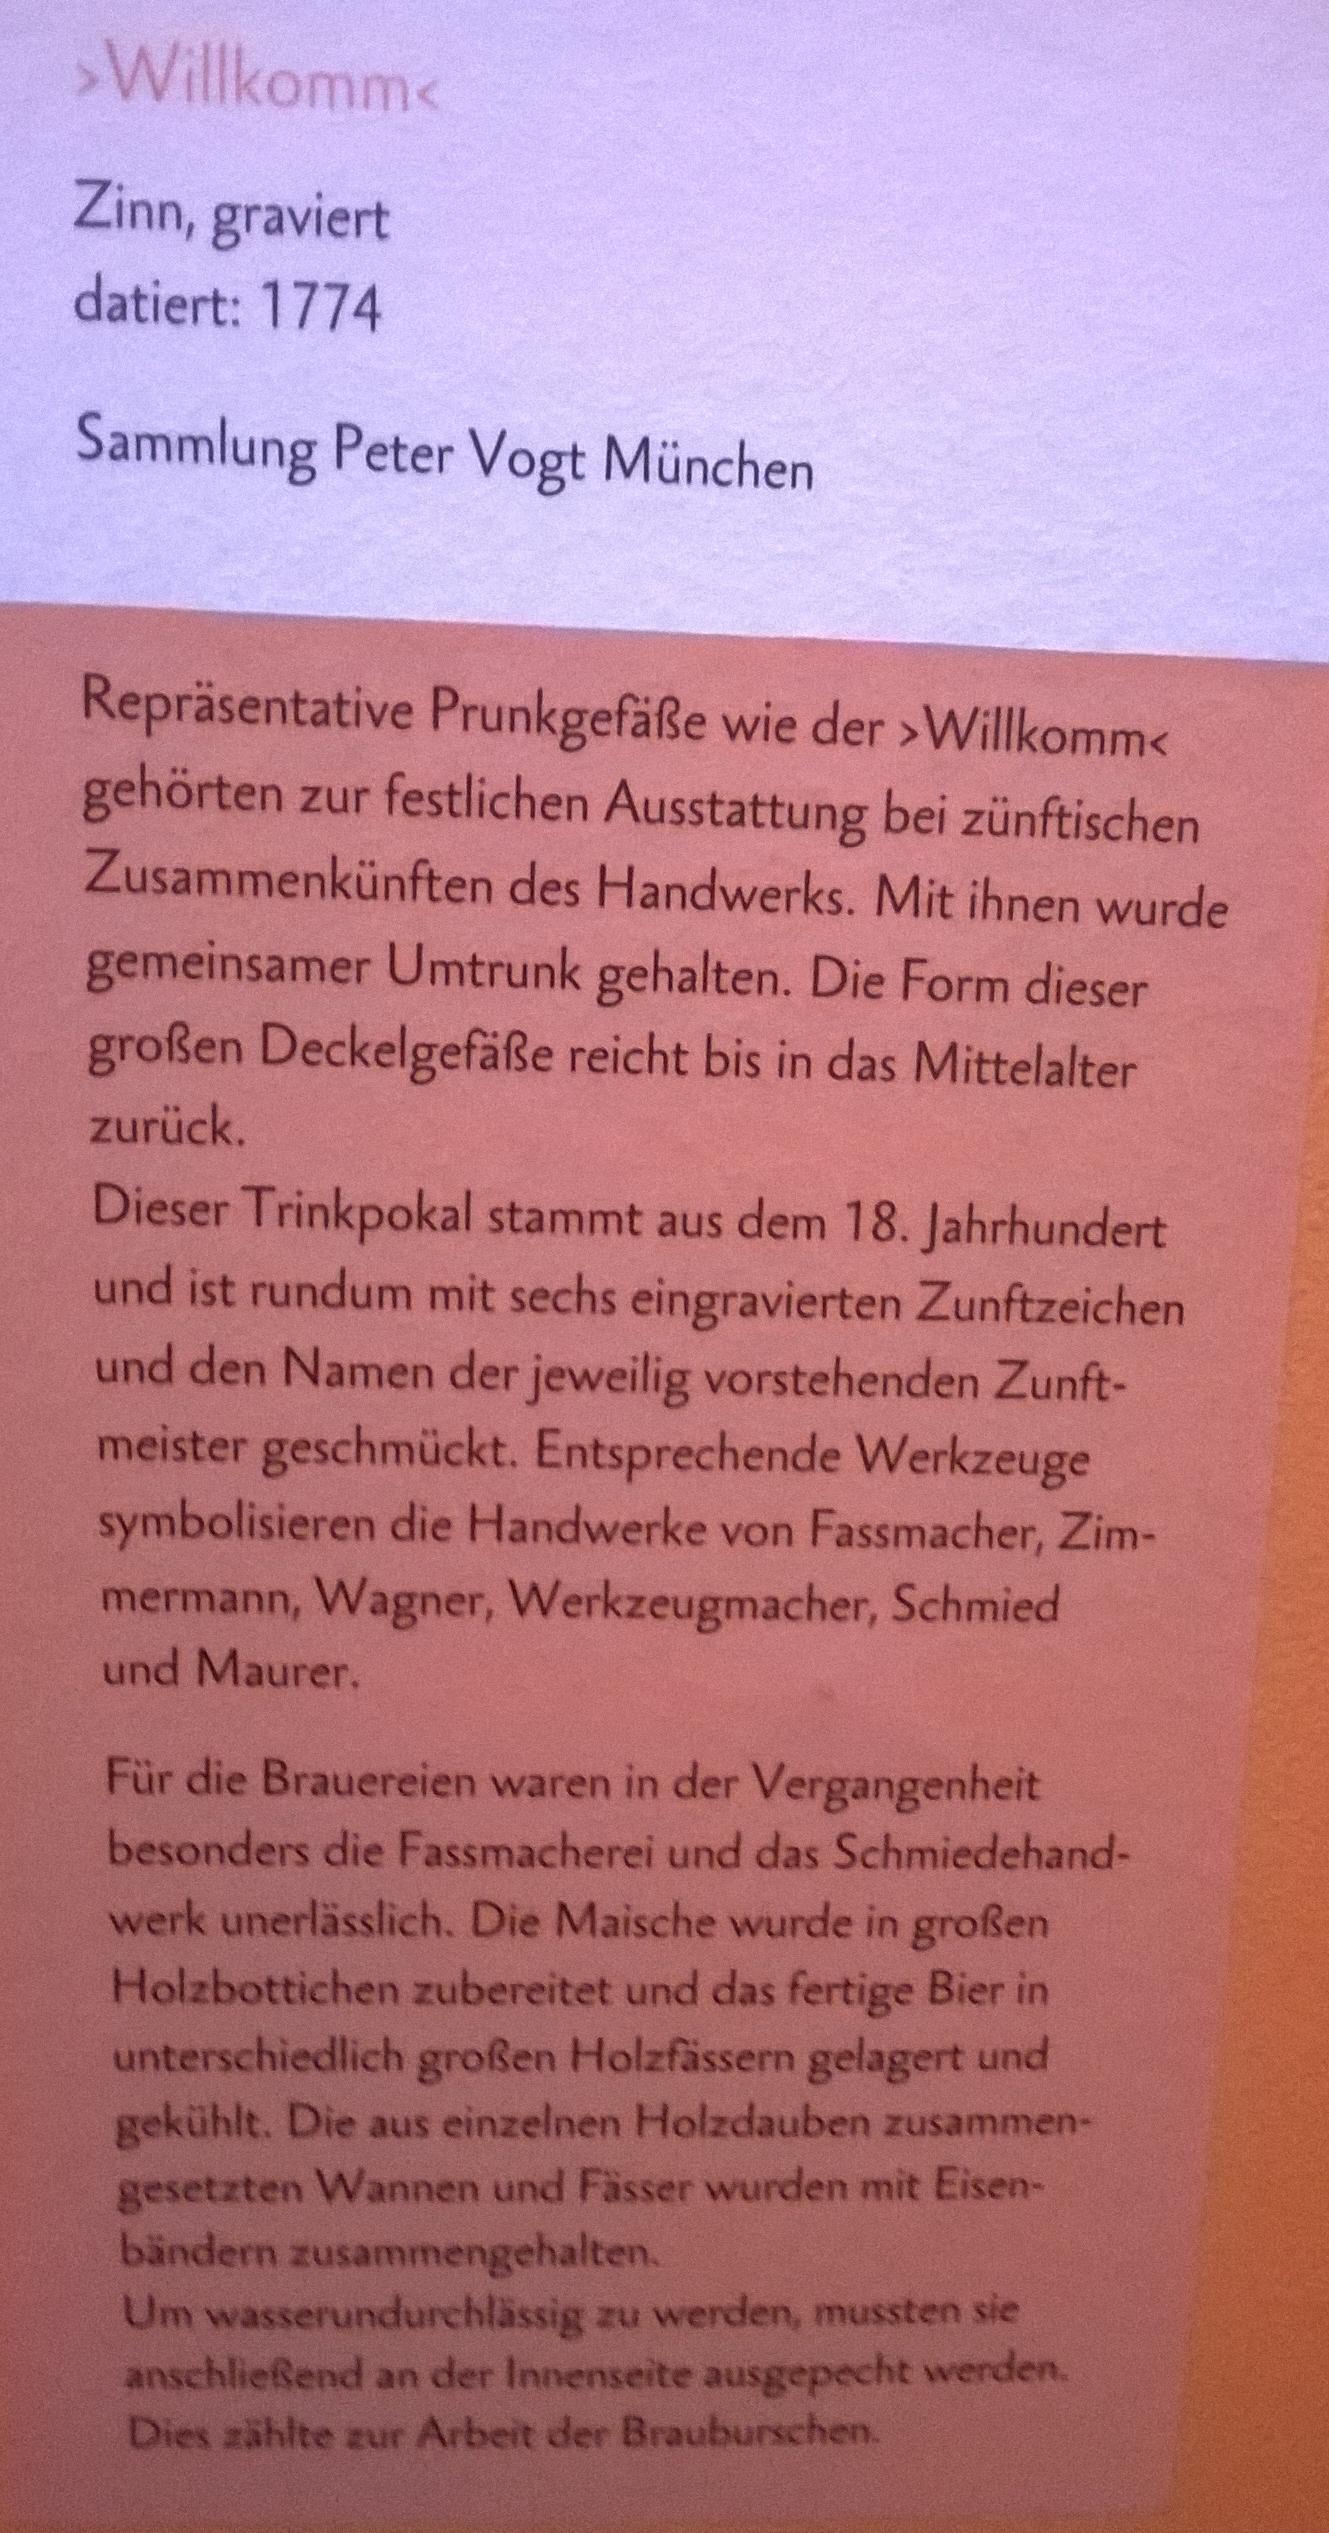 Willkomm Museum Dachau Bier lokal Ausstellung Sammlung Peter Vogt München